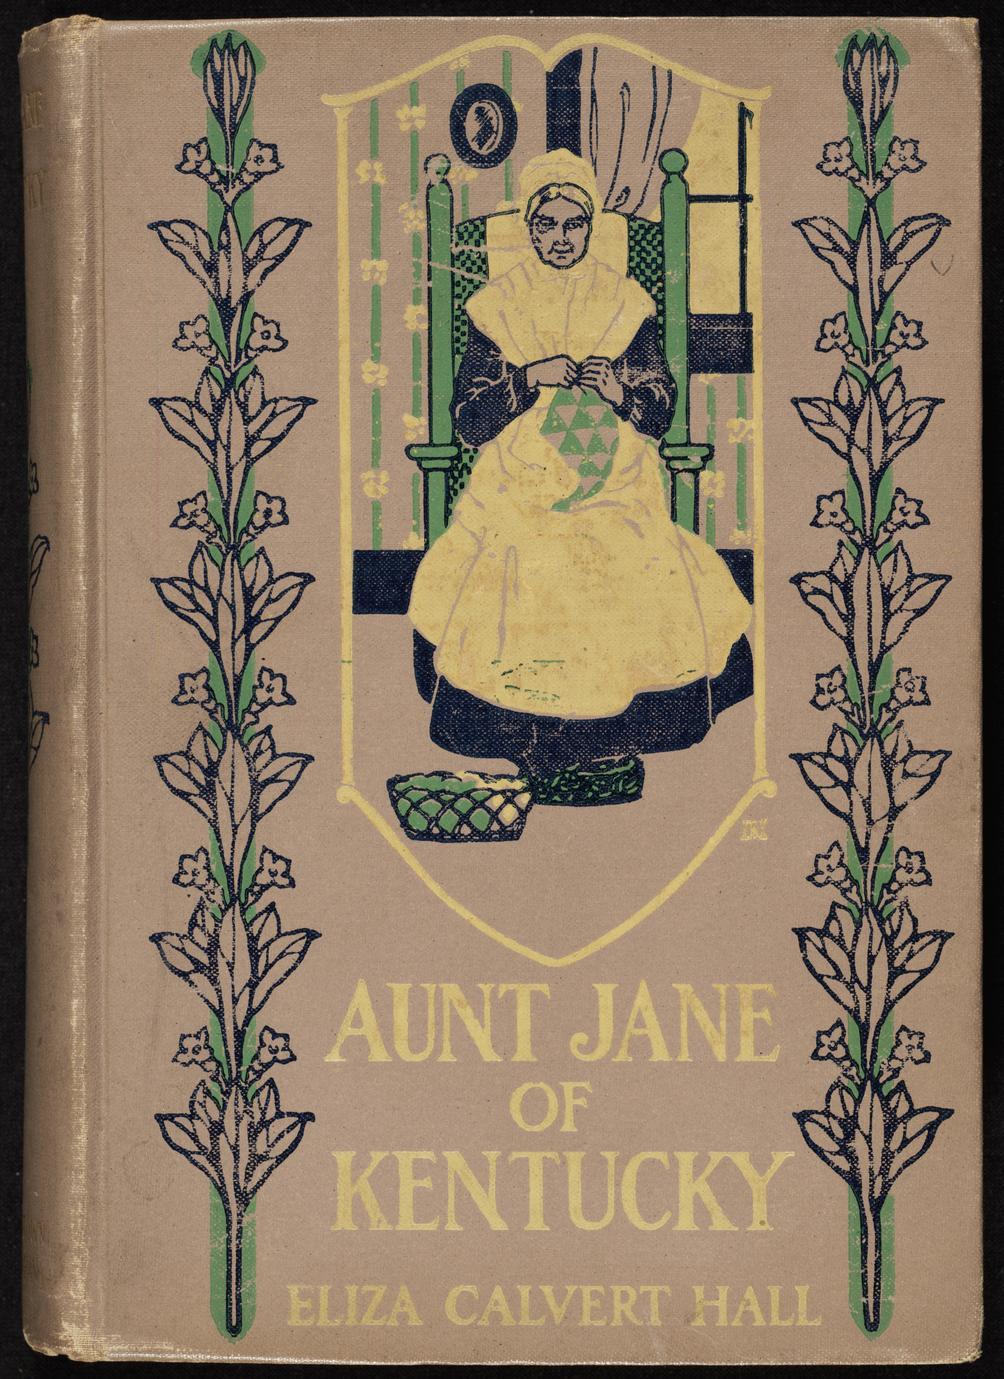 Aunt Jane of Kentucky (1 of 3)